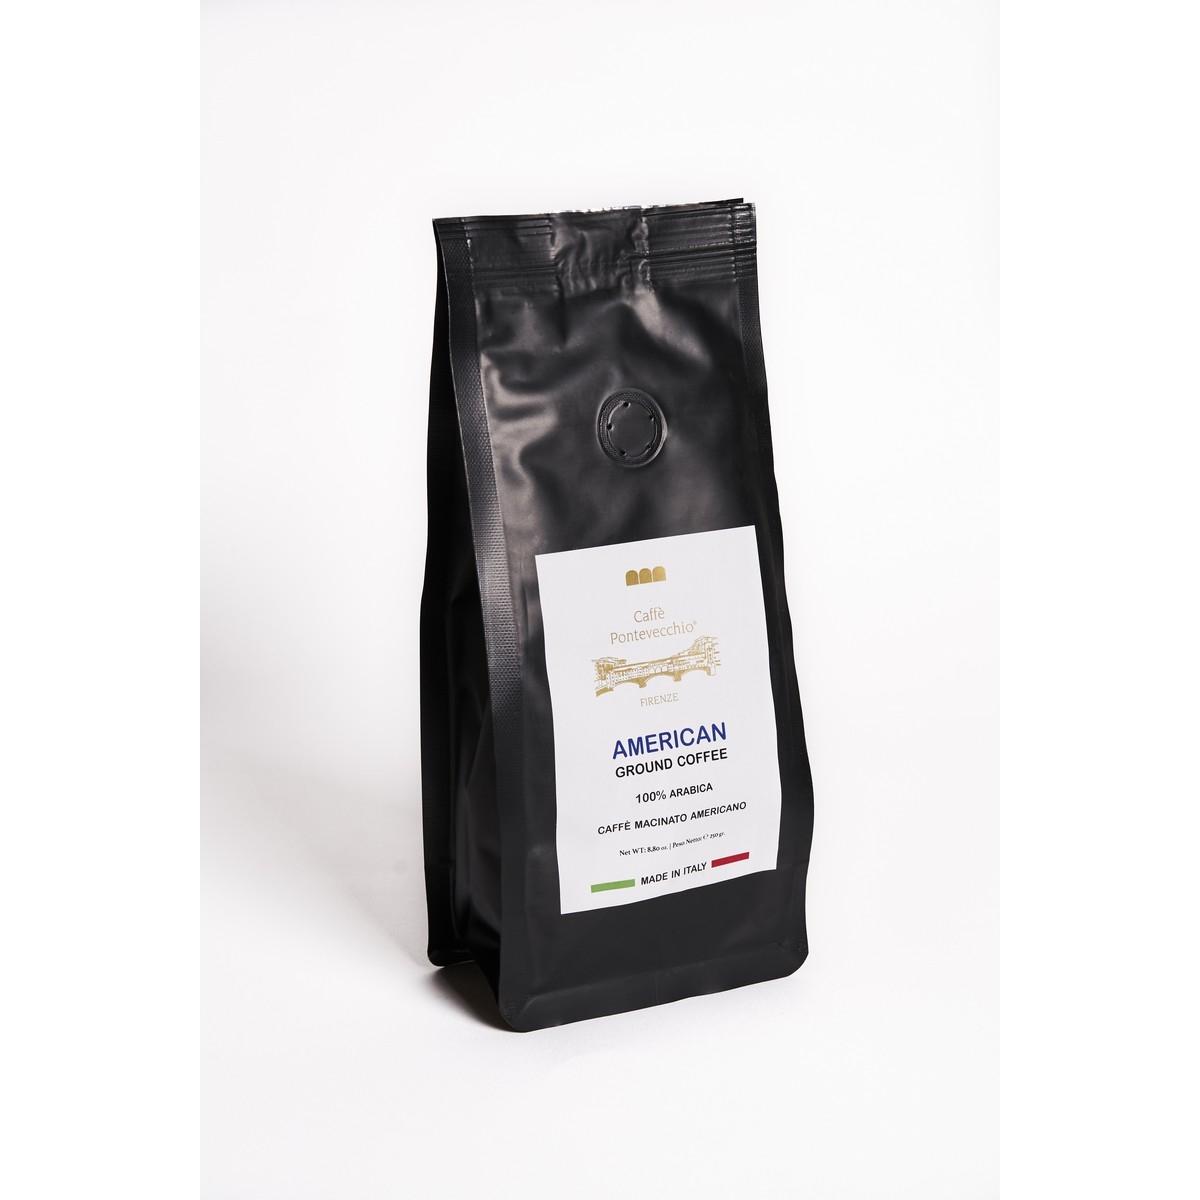 American Ground Coffee - BOX of 250 grams American  - Paper Filter- 100% Arabica GOURMET